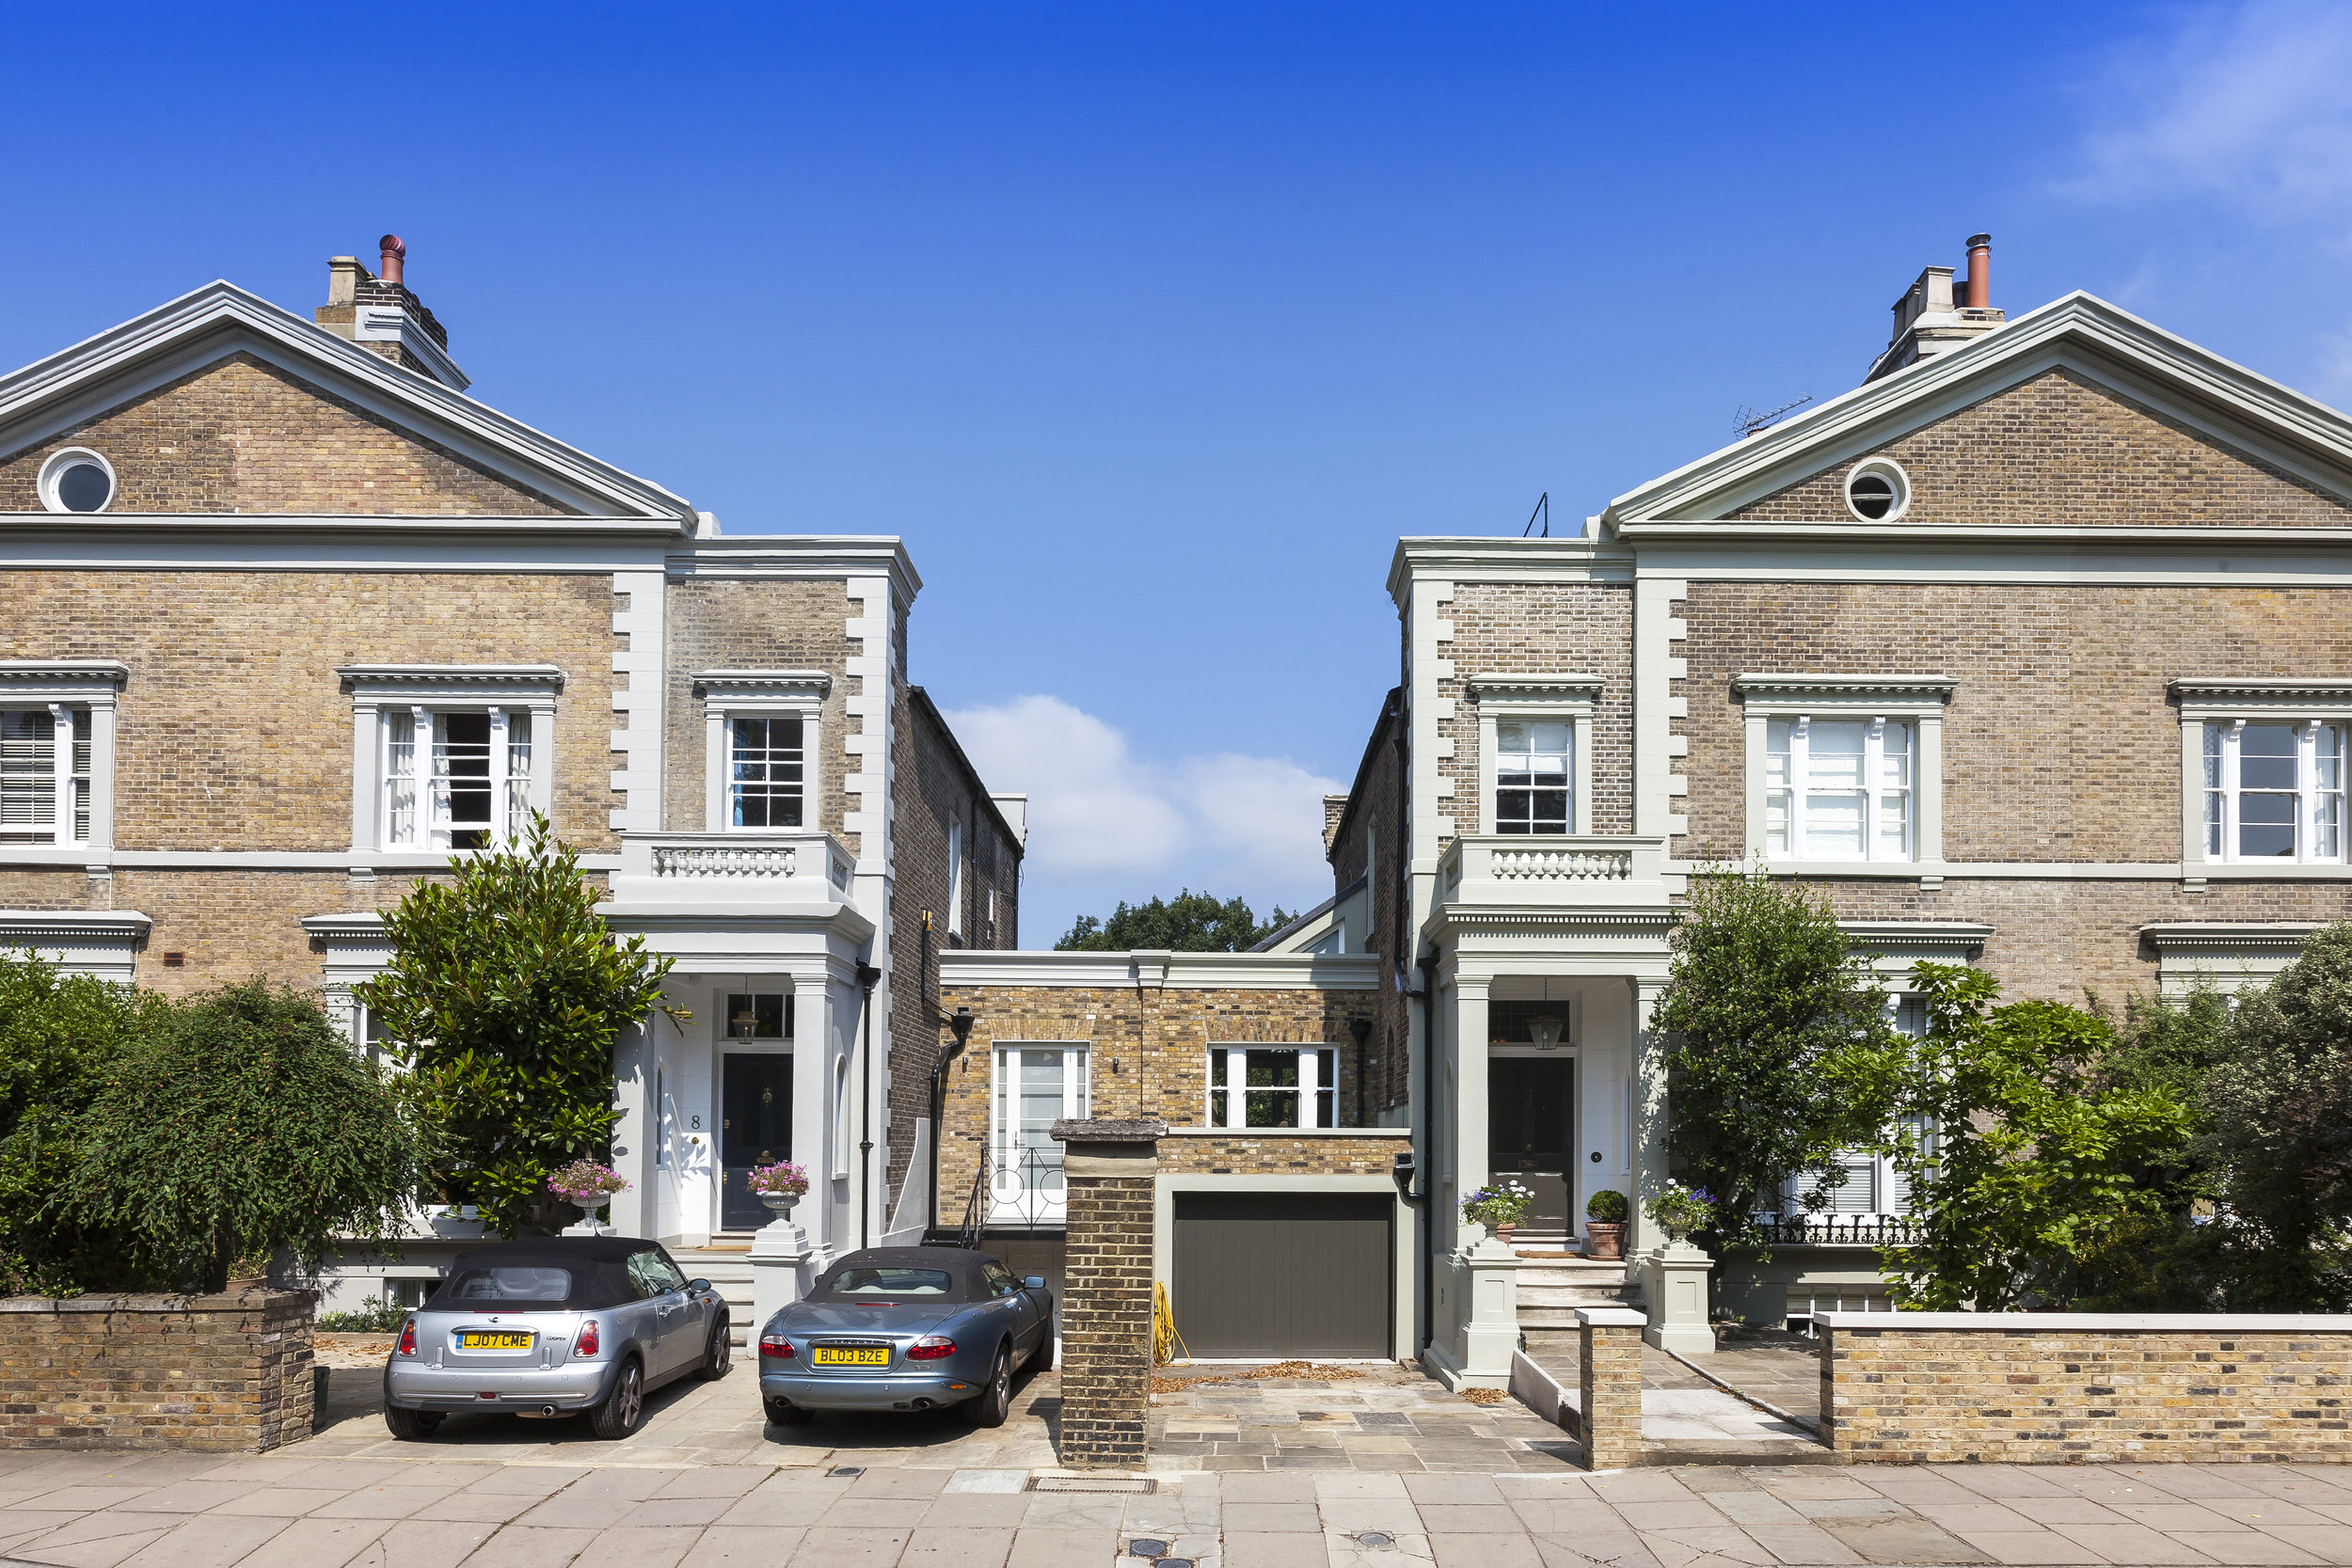 Pembroke Villas